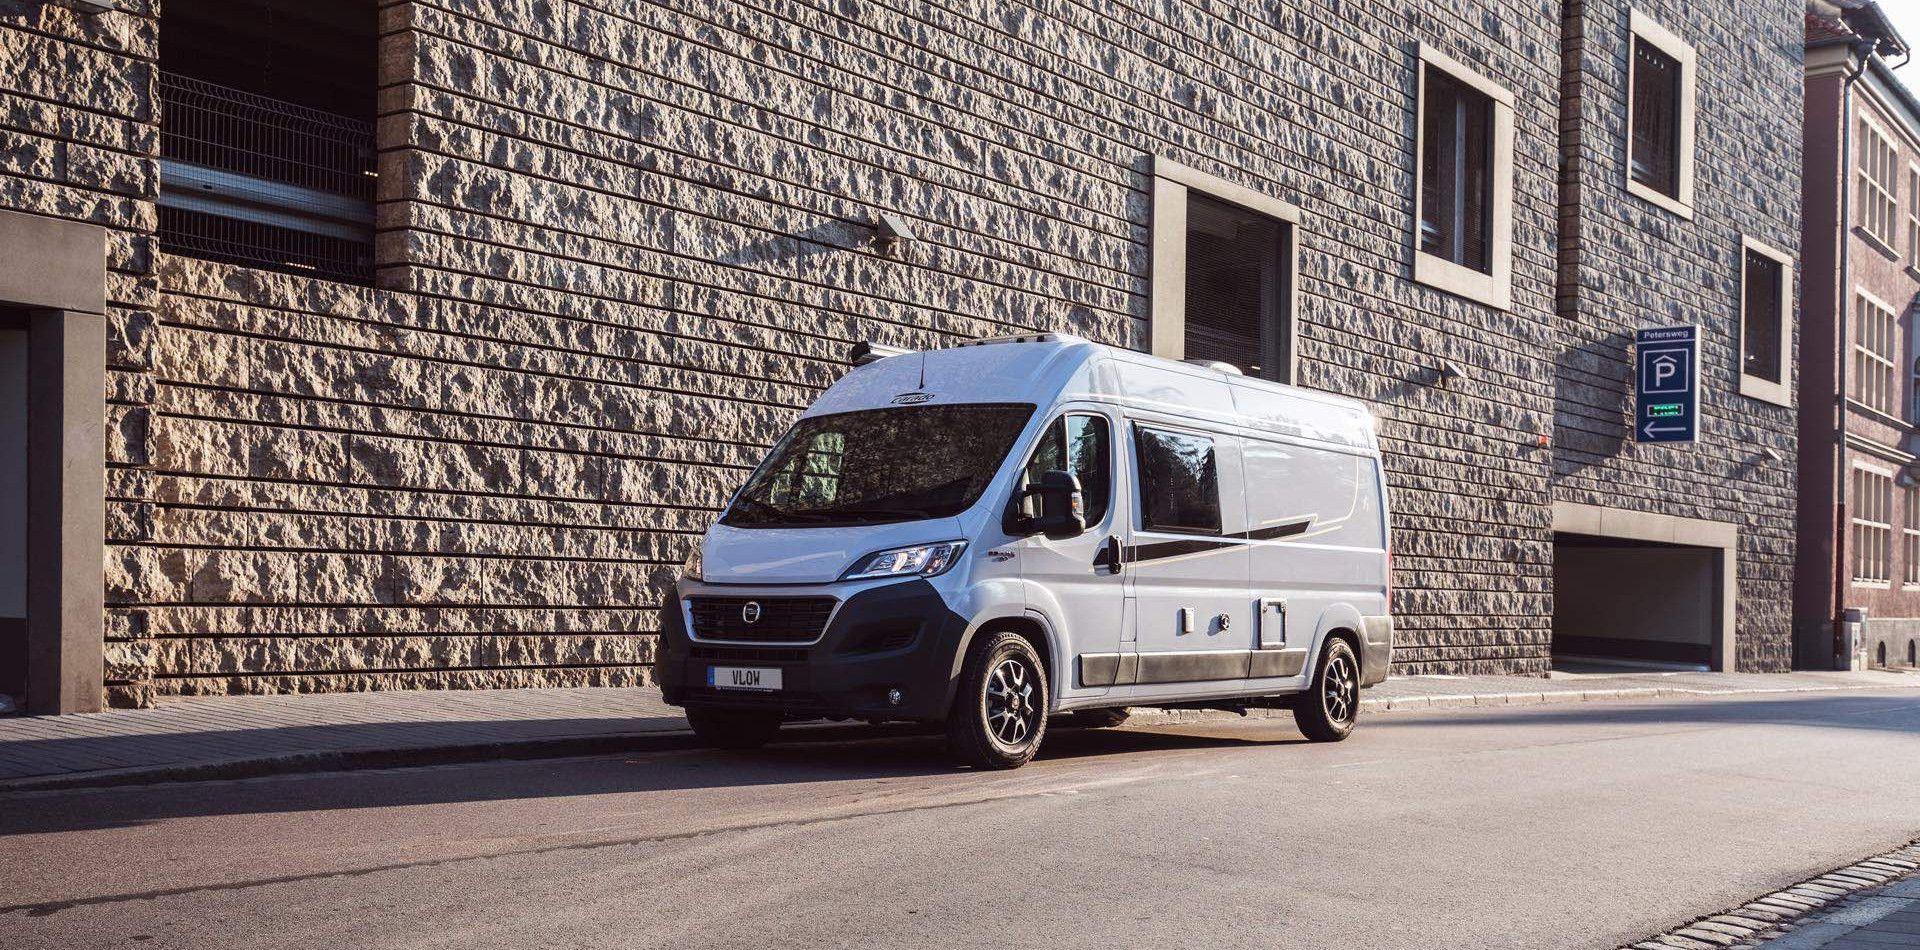 CARADO Hat Den VLOW CamperVan Camper Wohnmobil Reisemobil